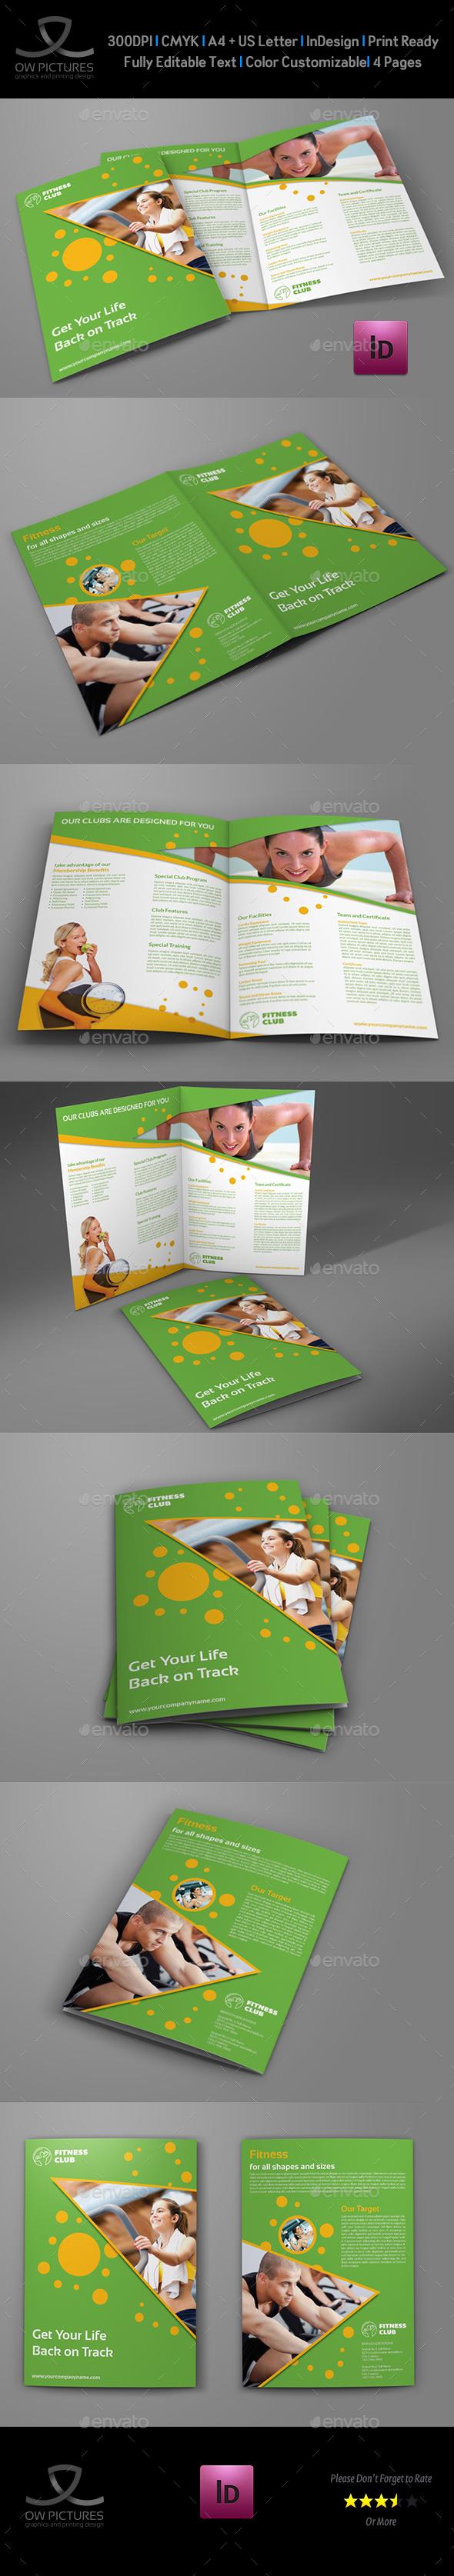 Fitness - GYM Bi-Fold Brochure Template - Brochures Print Templates